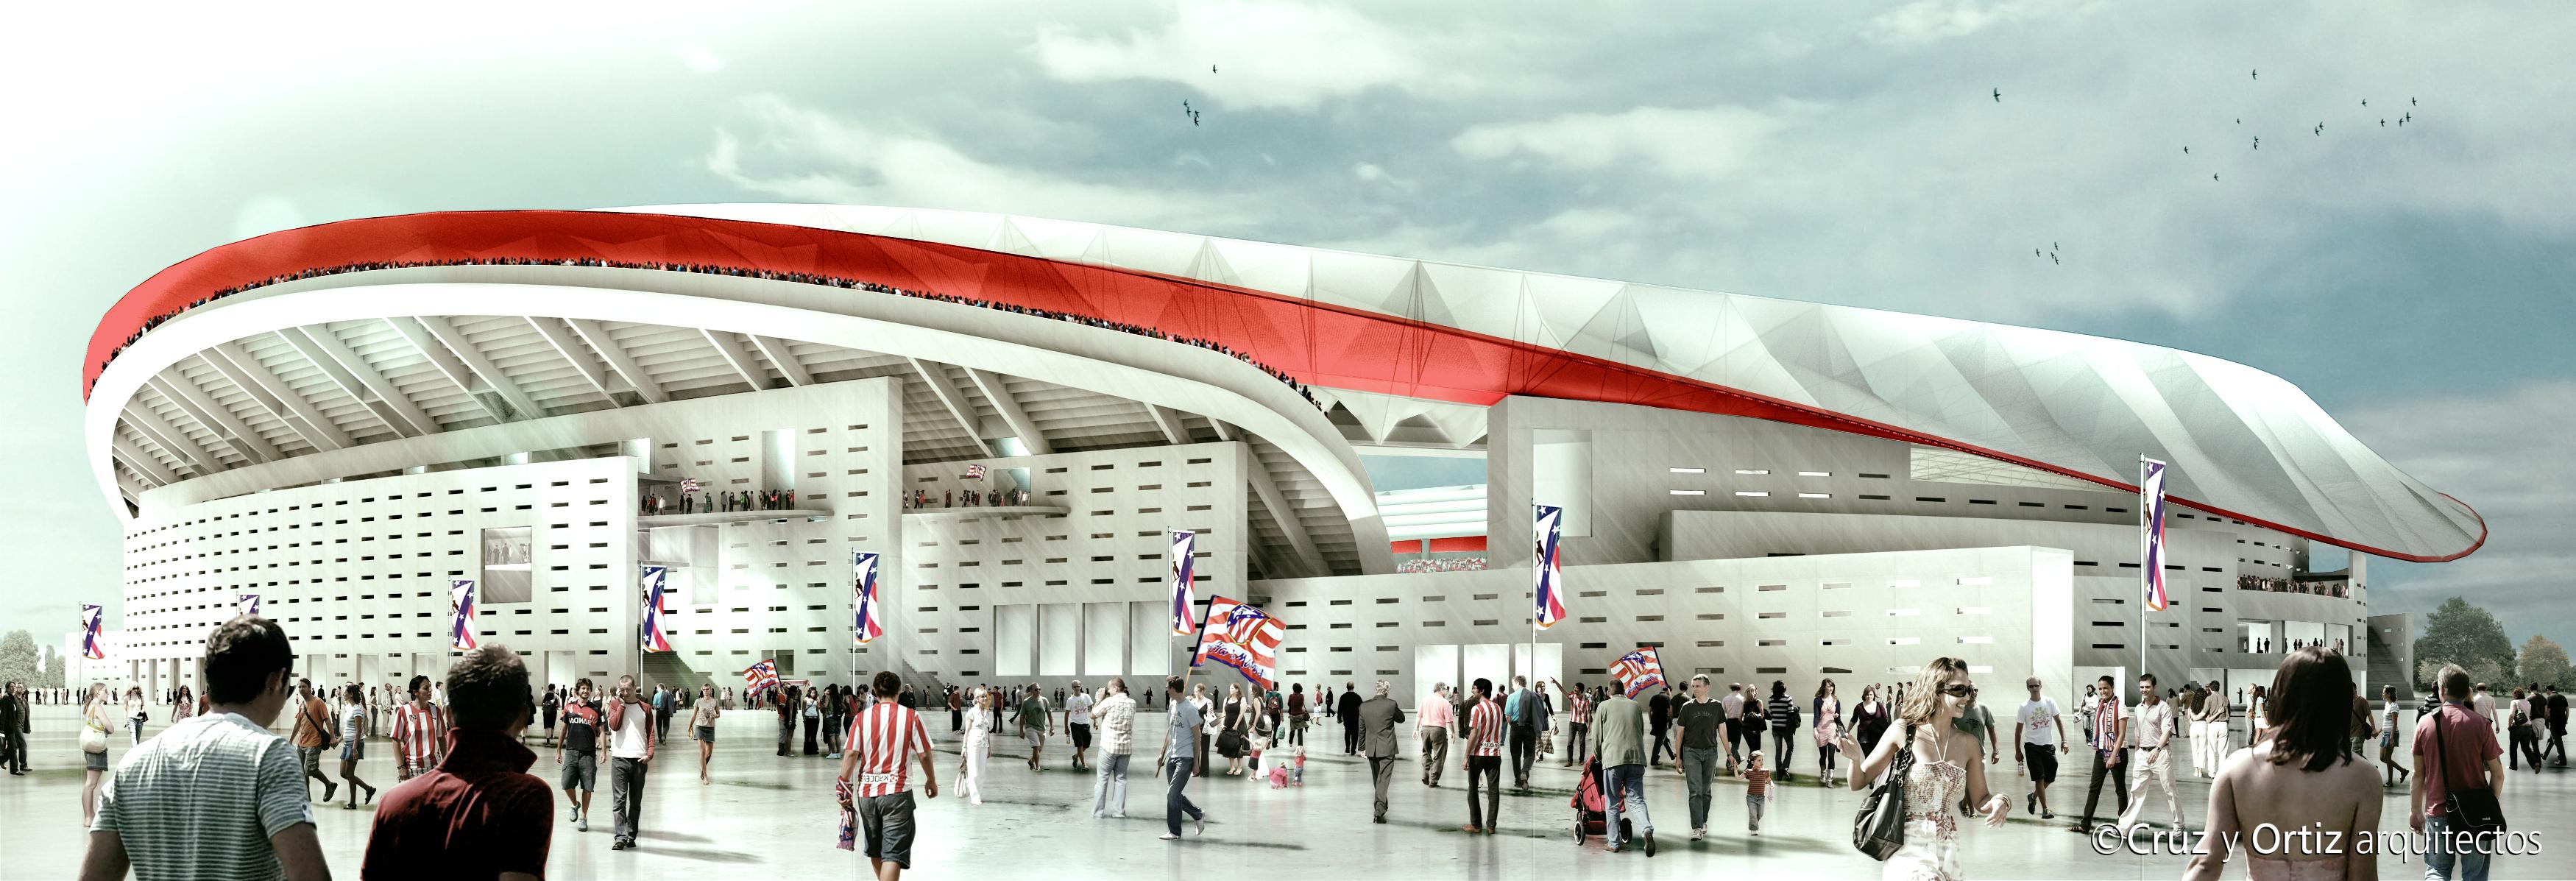 https://www.marcasrenombradas.com/wp-content/uploads/2011/07/Nuevo-Estadio-Ath-Madrid-Cruz-y-Ortiz-4.jpg